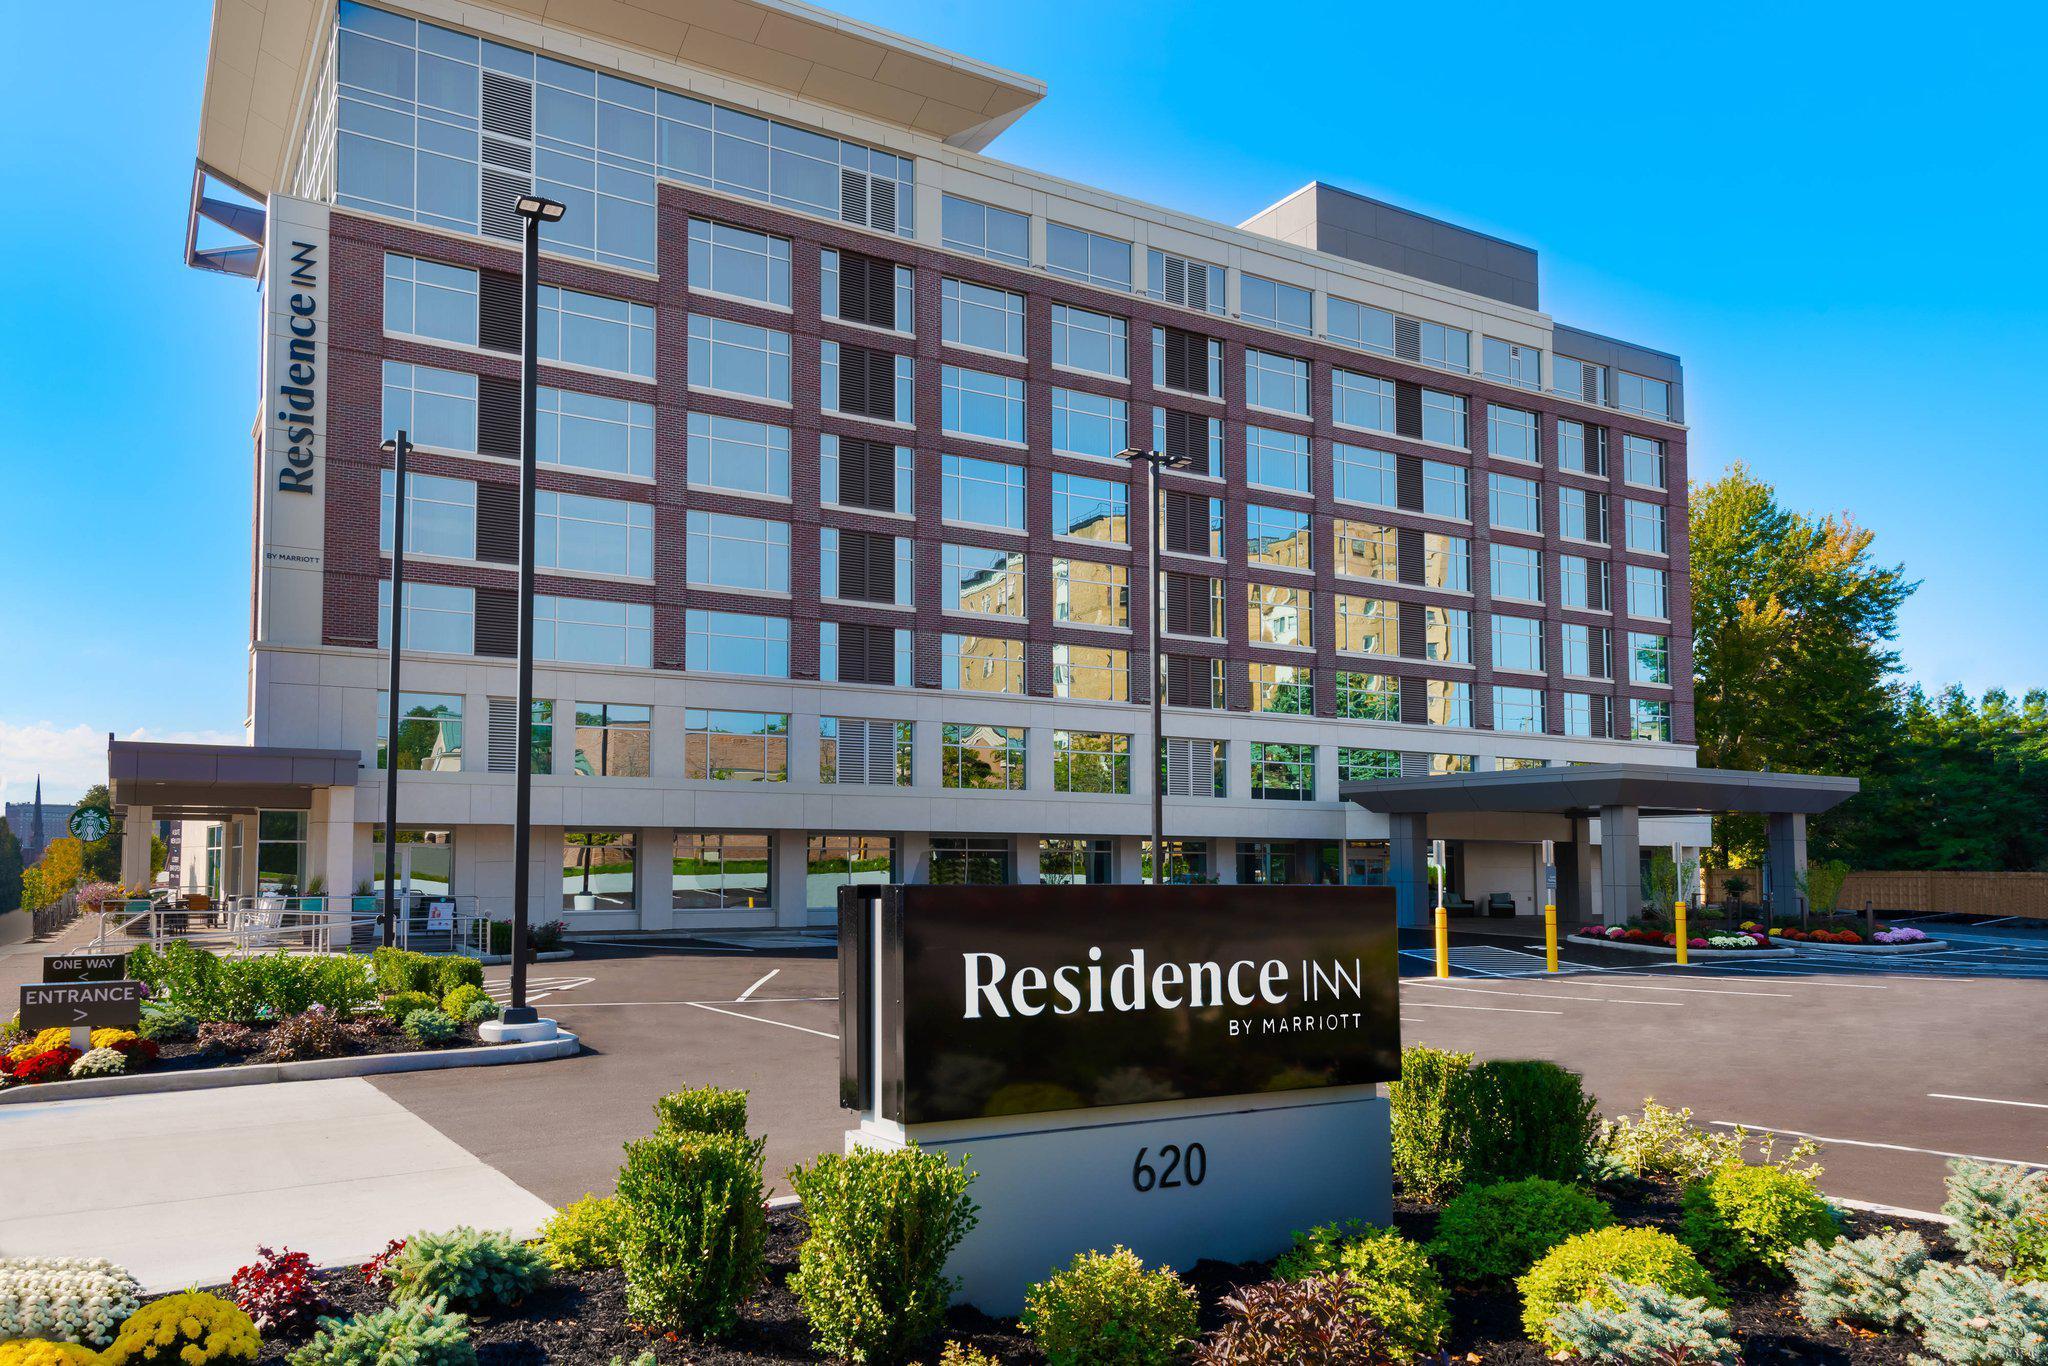 Residence Inn by Marriott Buffalo Downtown